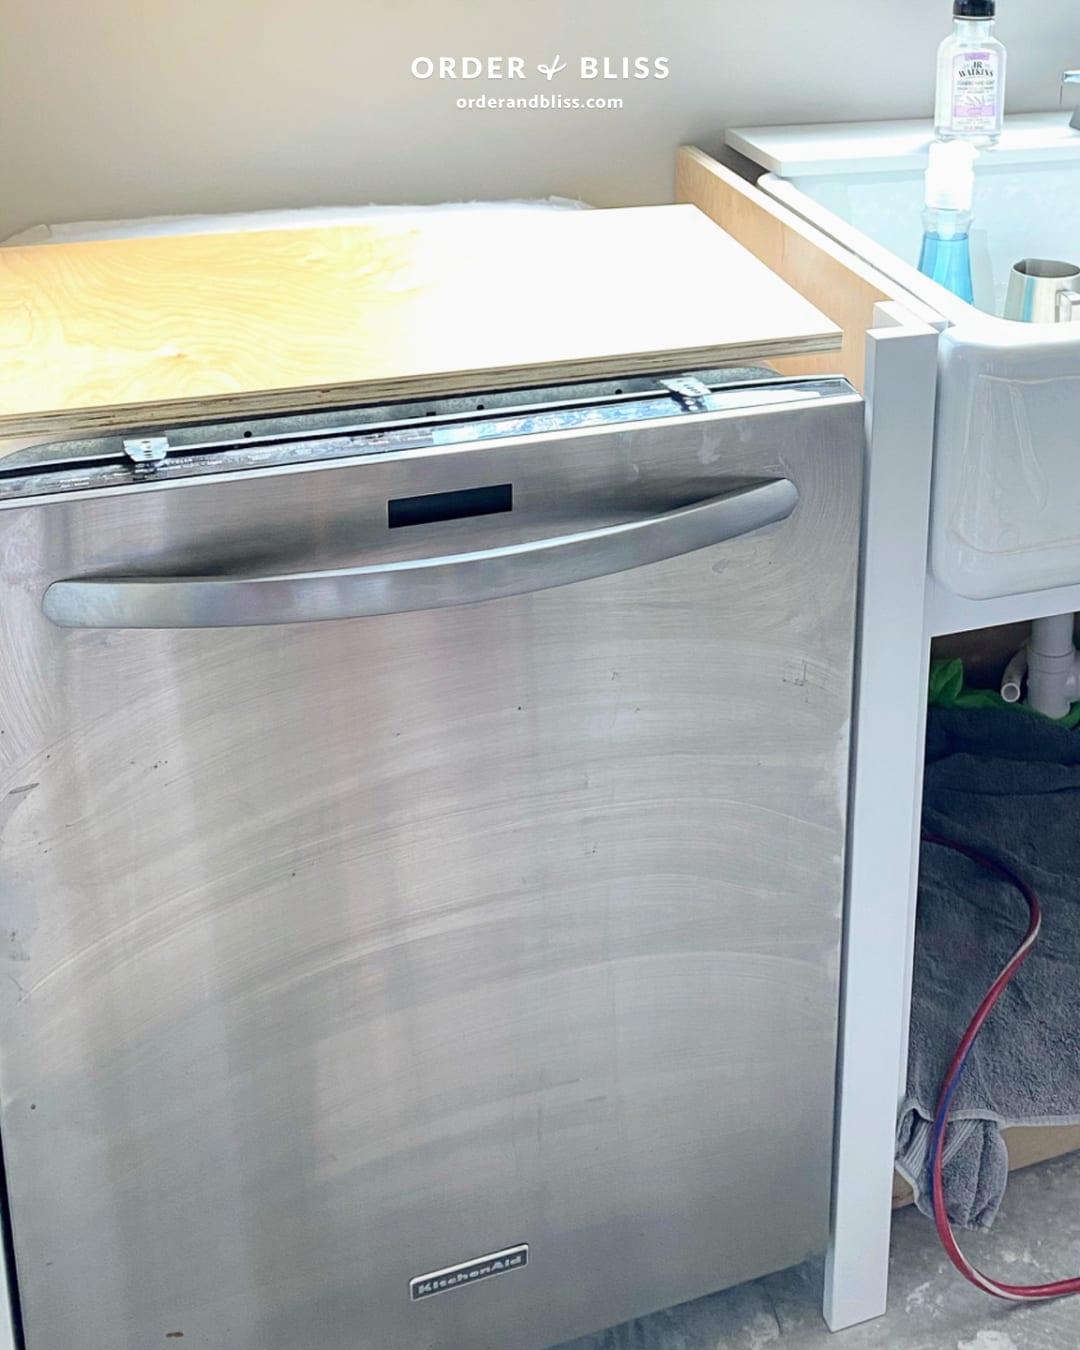 KitchenAid dishwasher during kitchen remodel